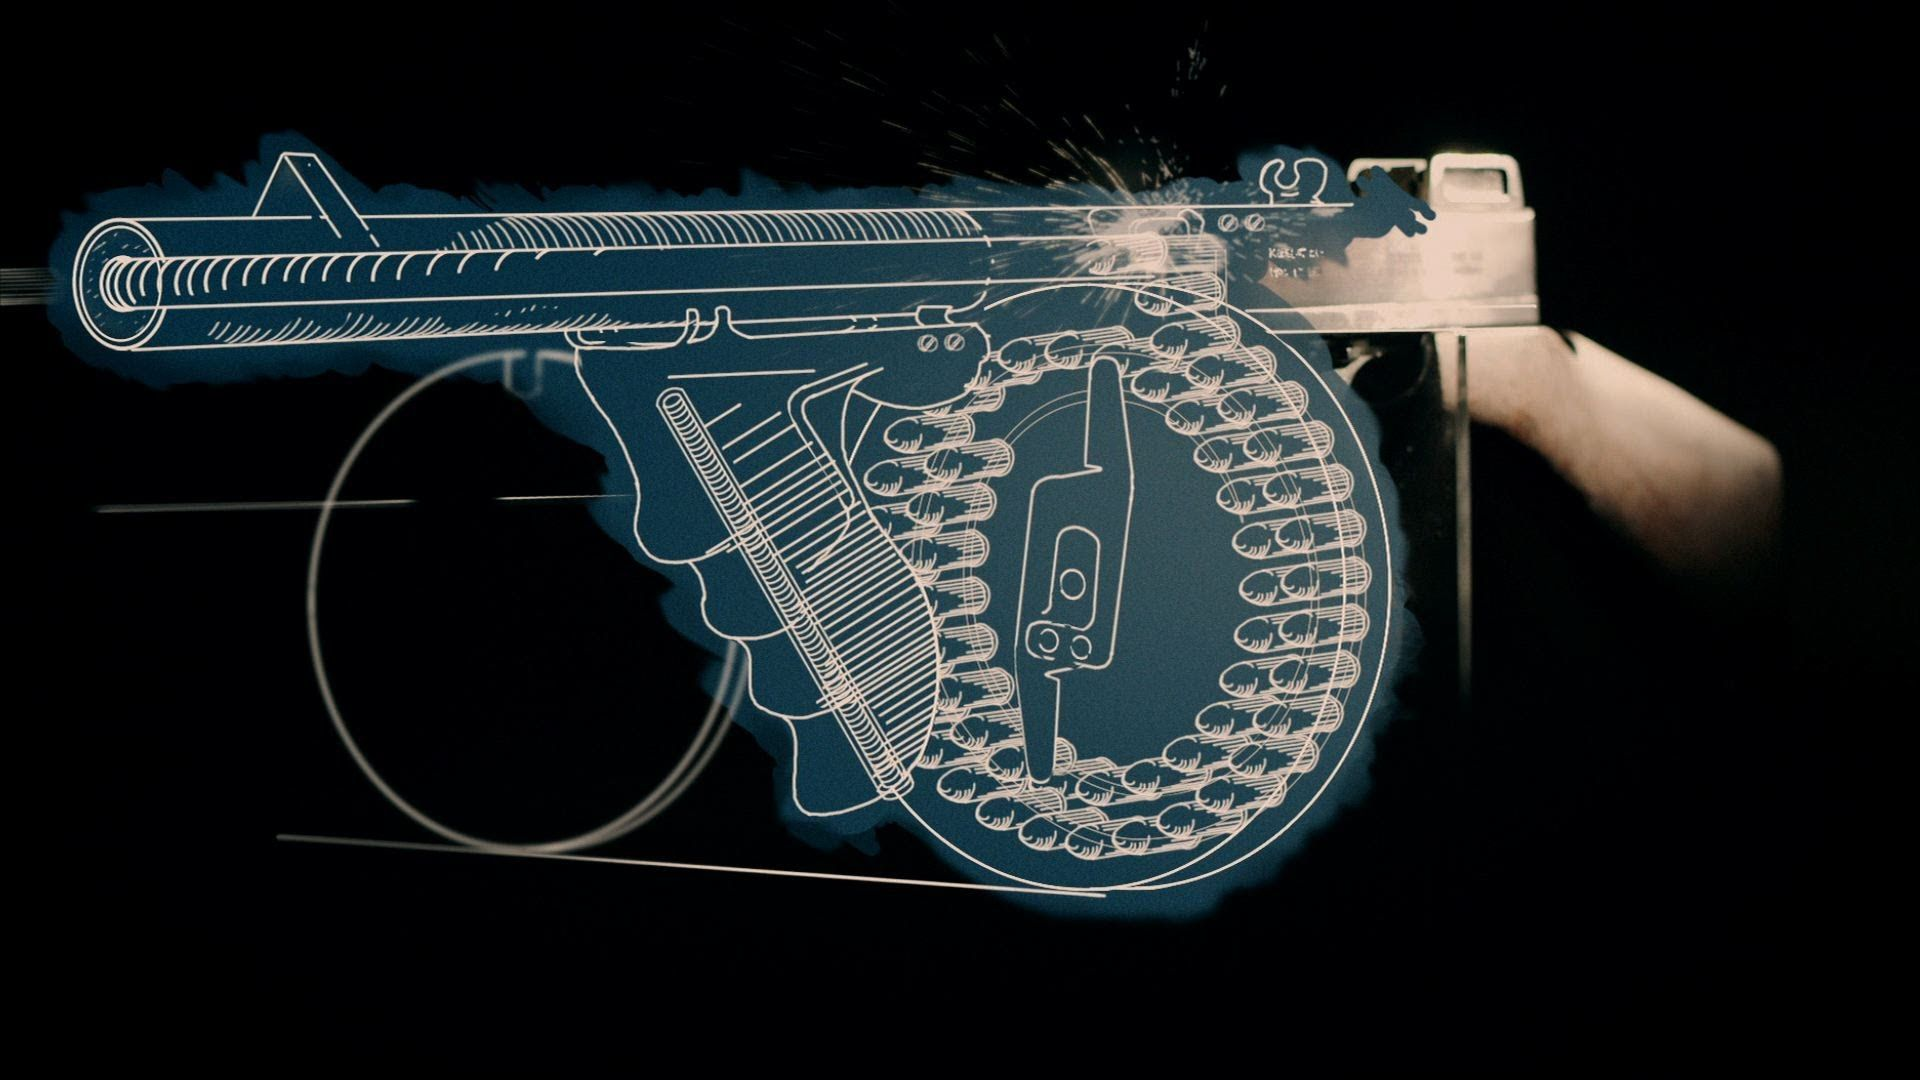 Tommy Gun Fallout New Vegas Wallpaper